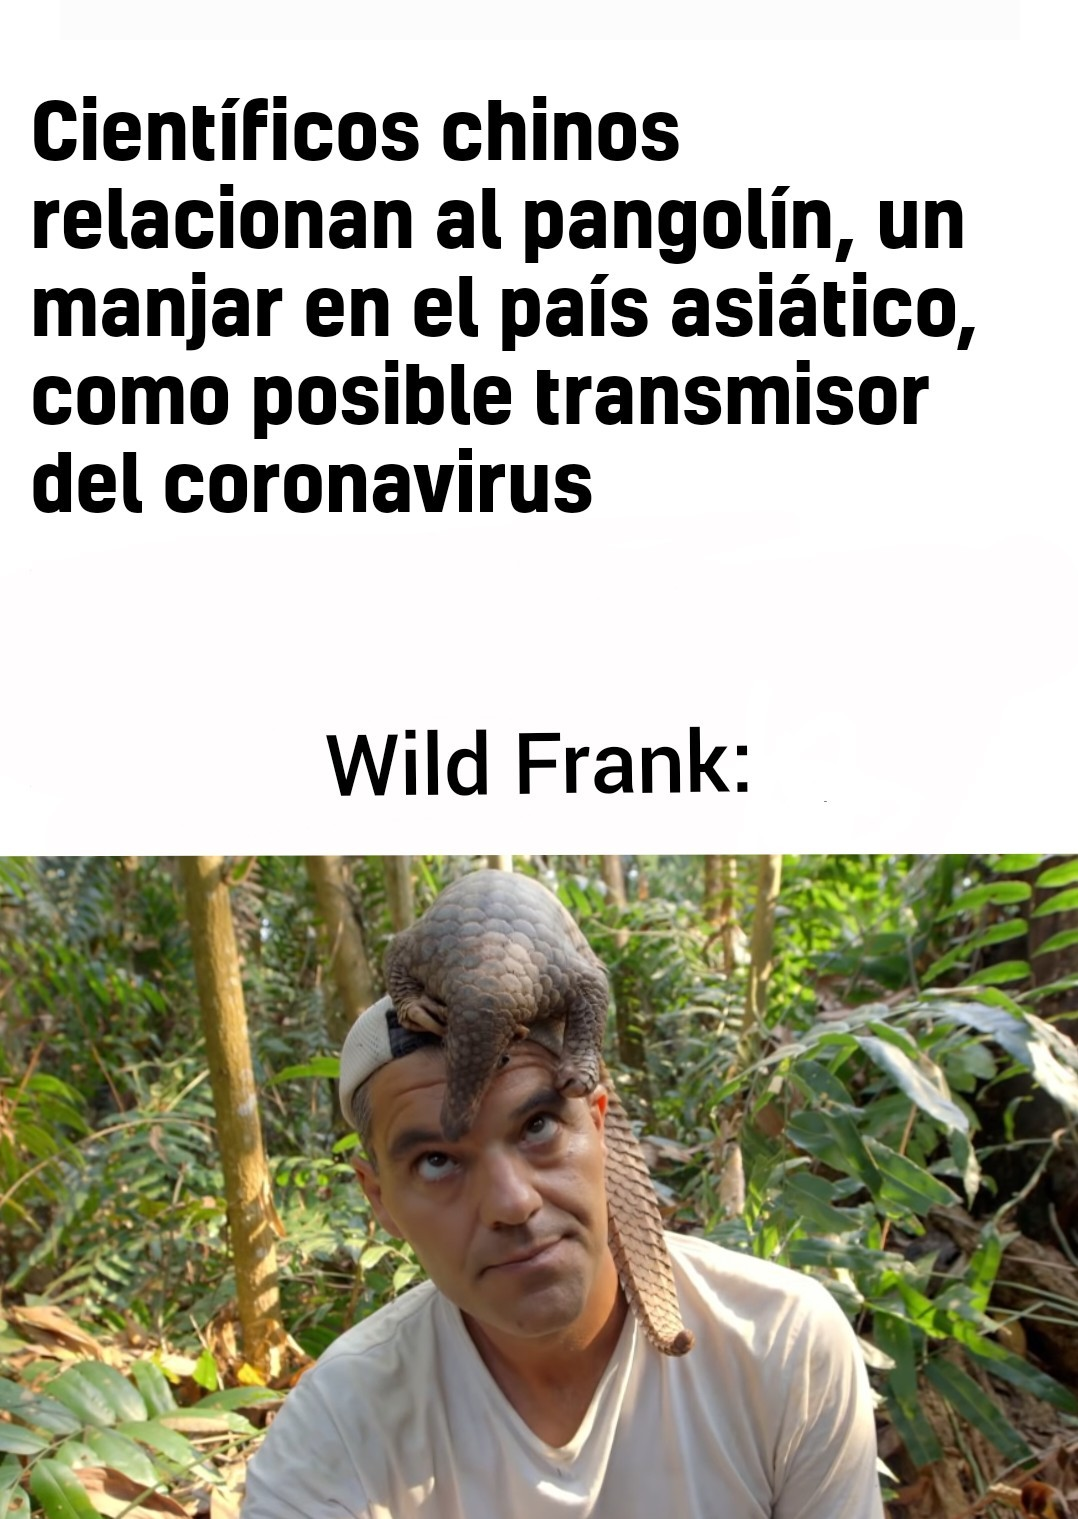 F por Wild Frank - meme